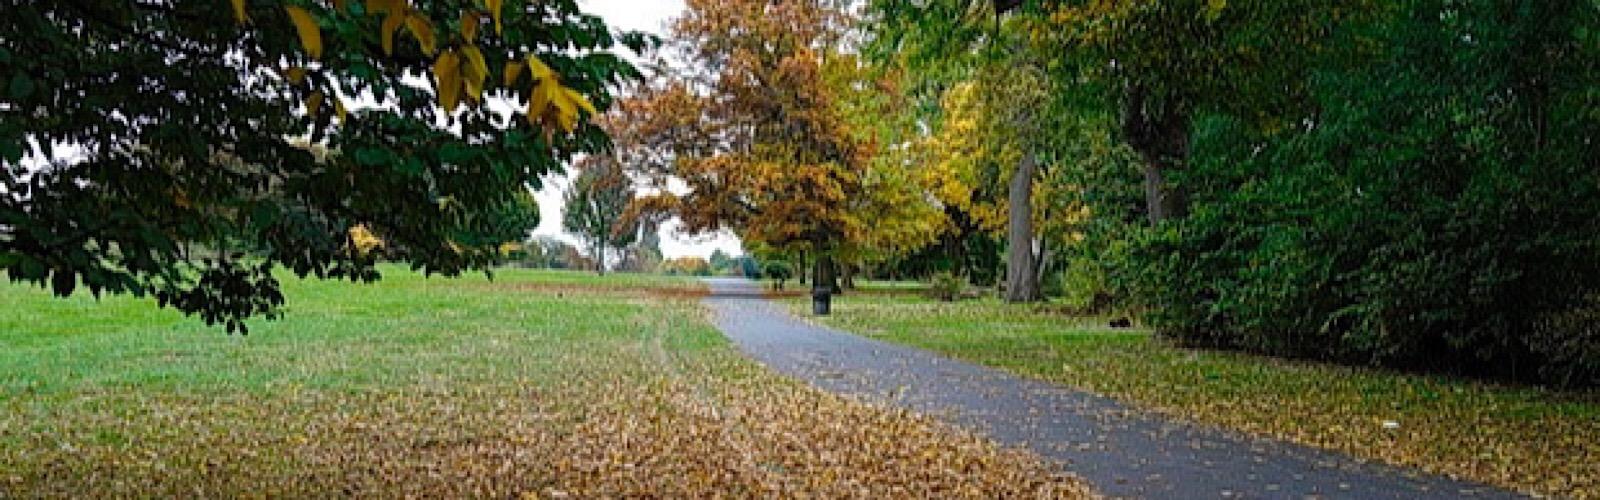 brockwell park 1600x500